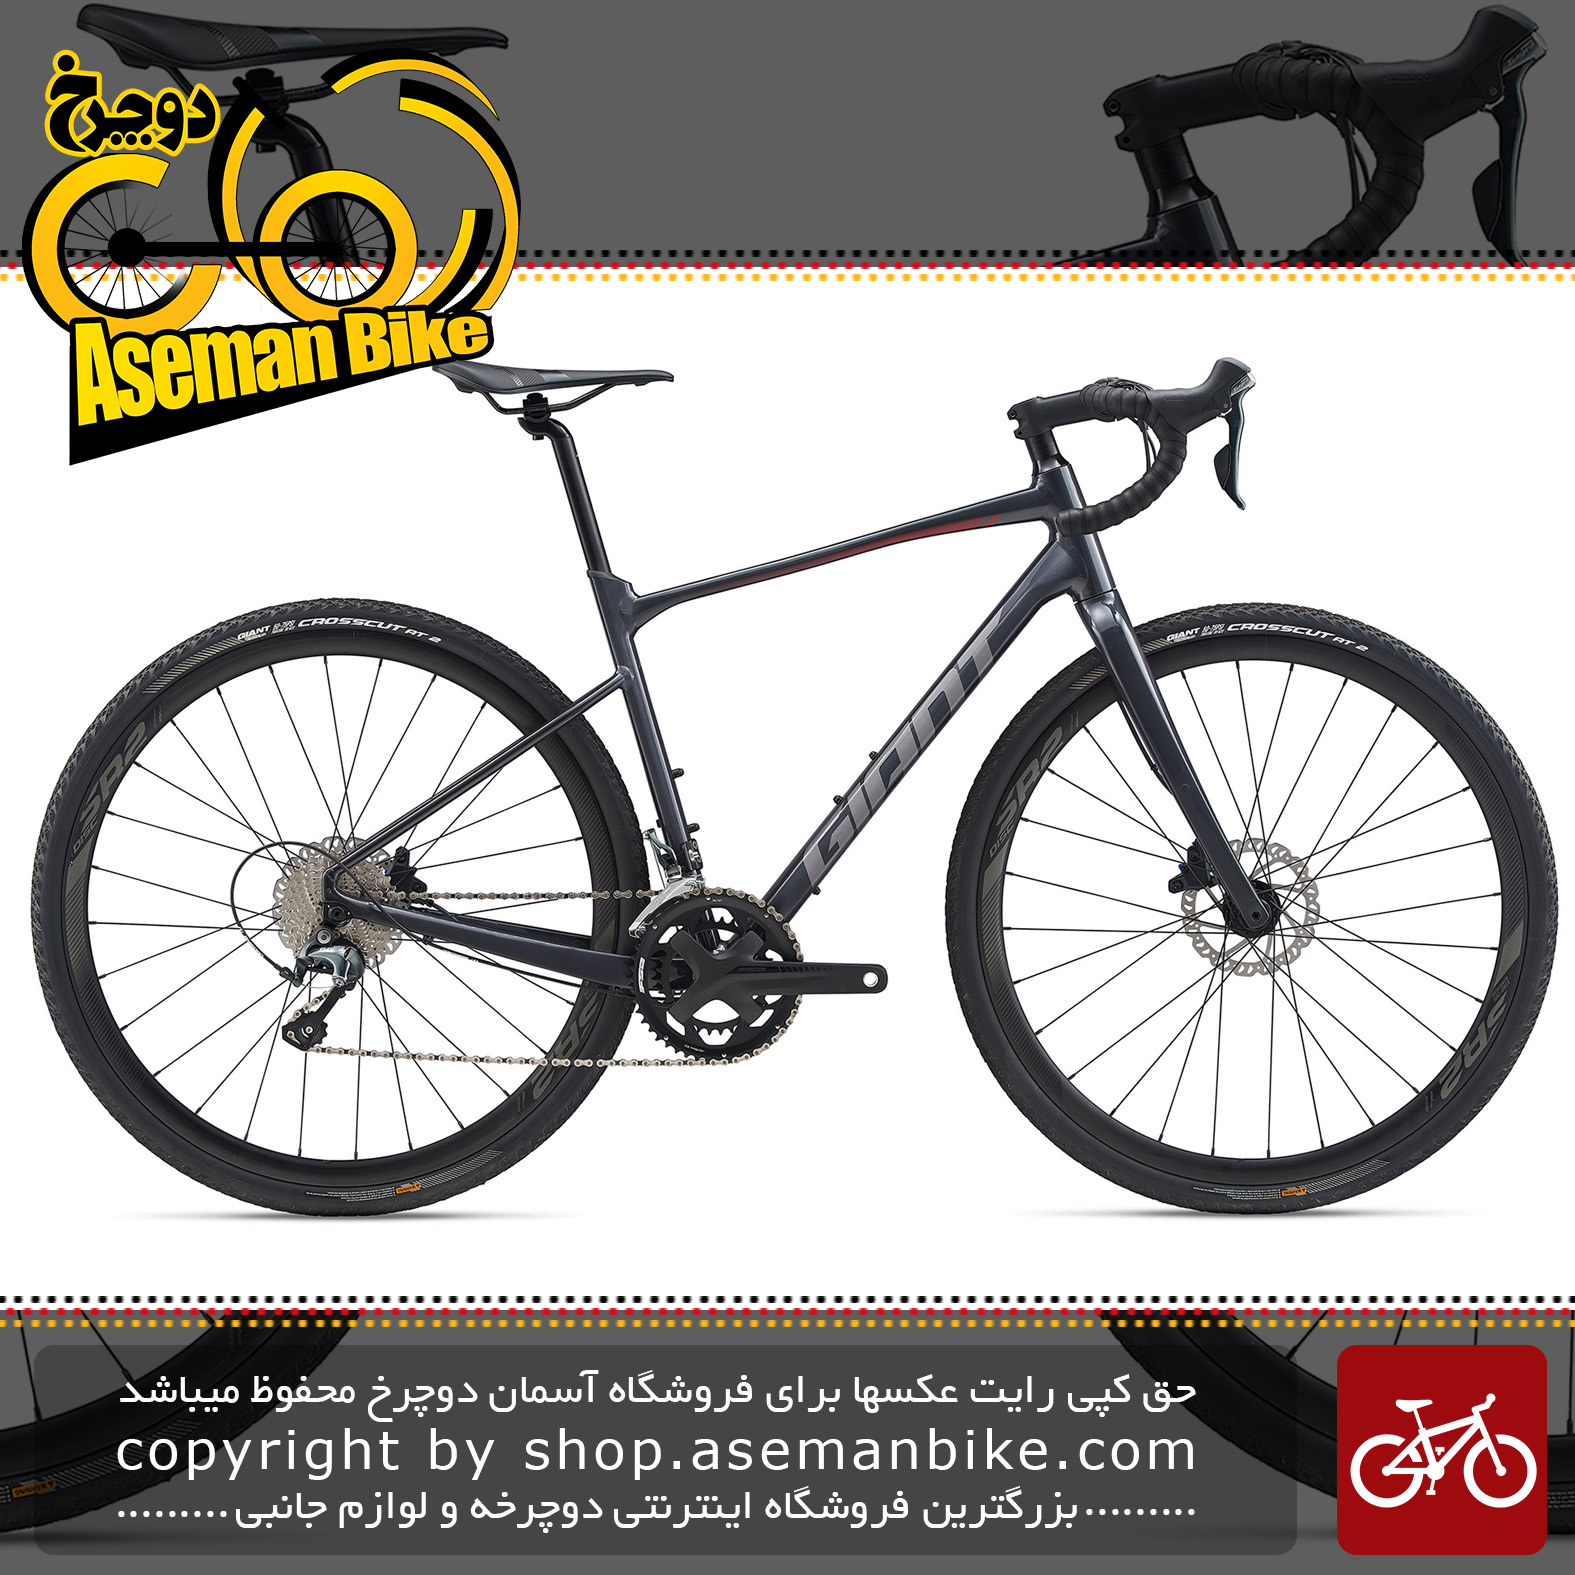 دوچرخه دومنظوره جاینت مدل ریولت 1 2020 Giant Gravel Bicycle Revolt 1 2020